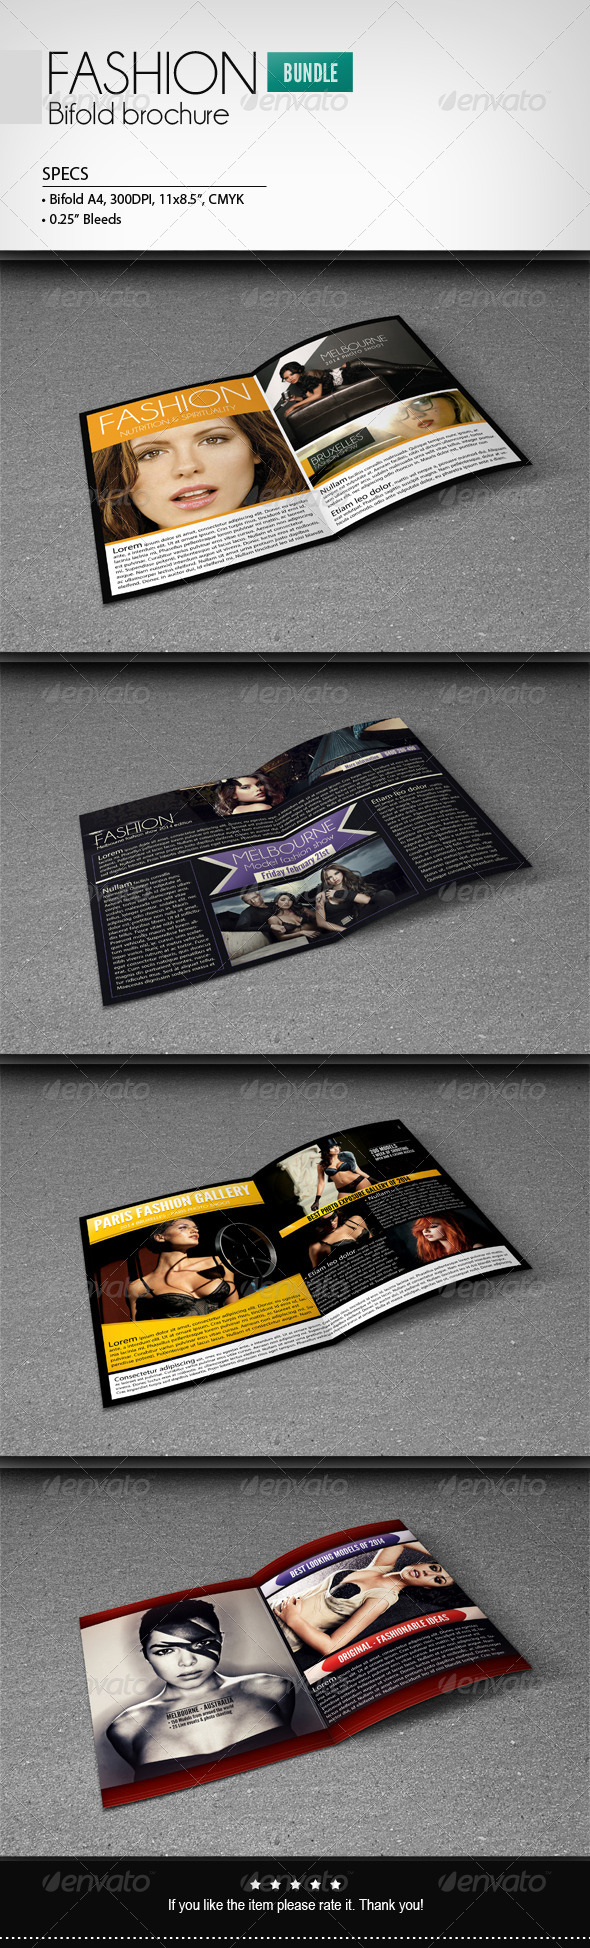 GraphicRiver Fashion Bifold Brochure [Bundle] 6973831